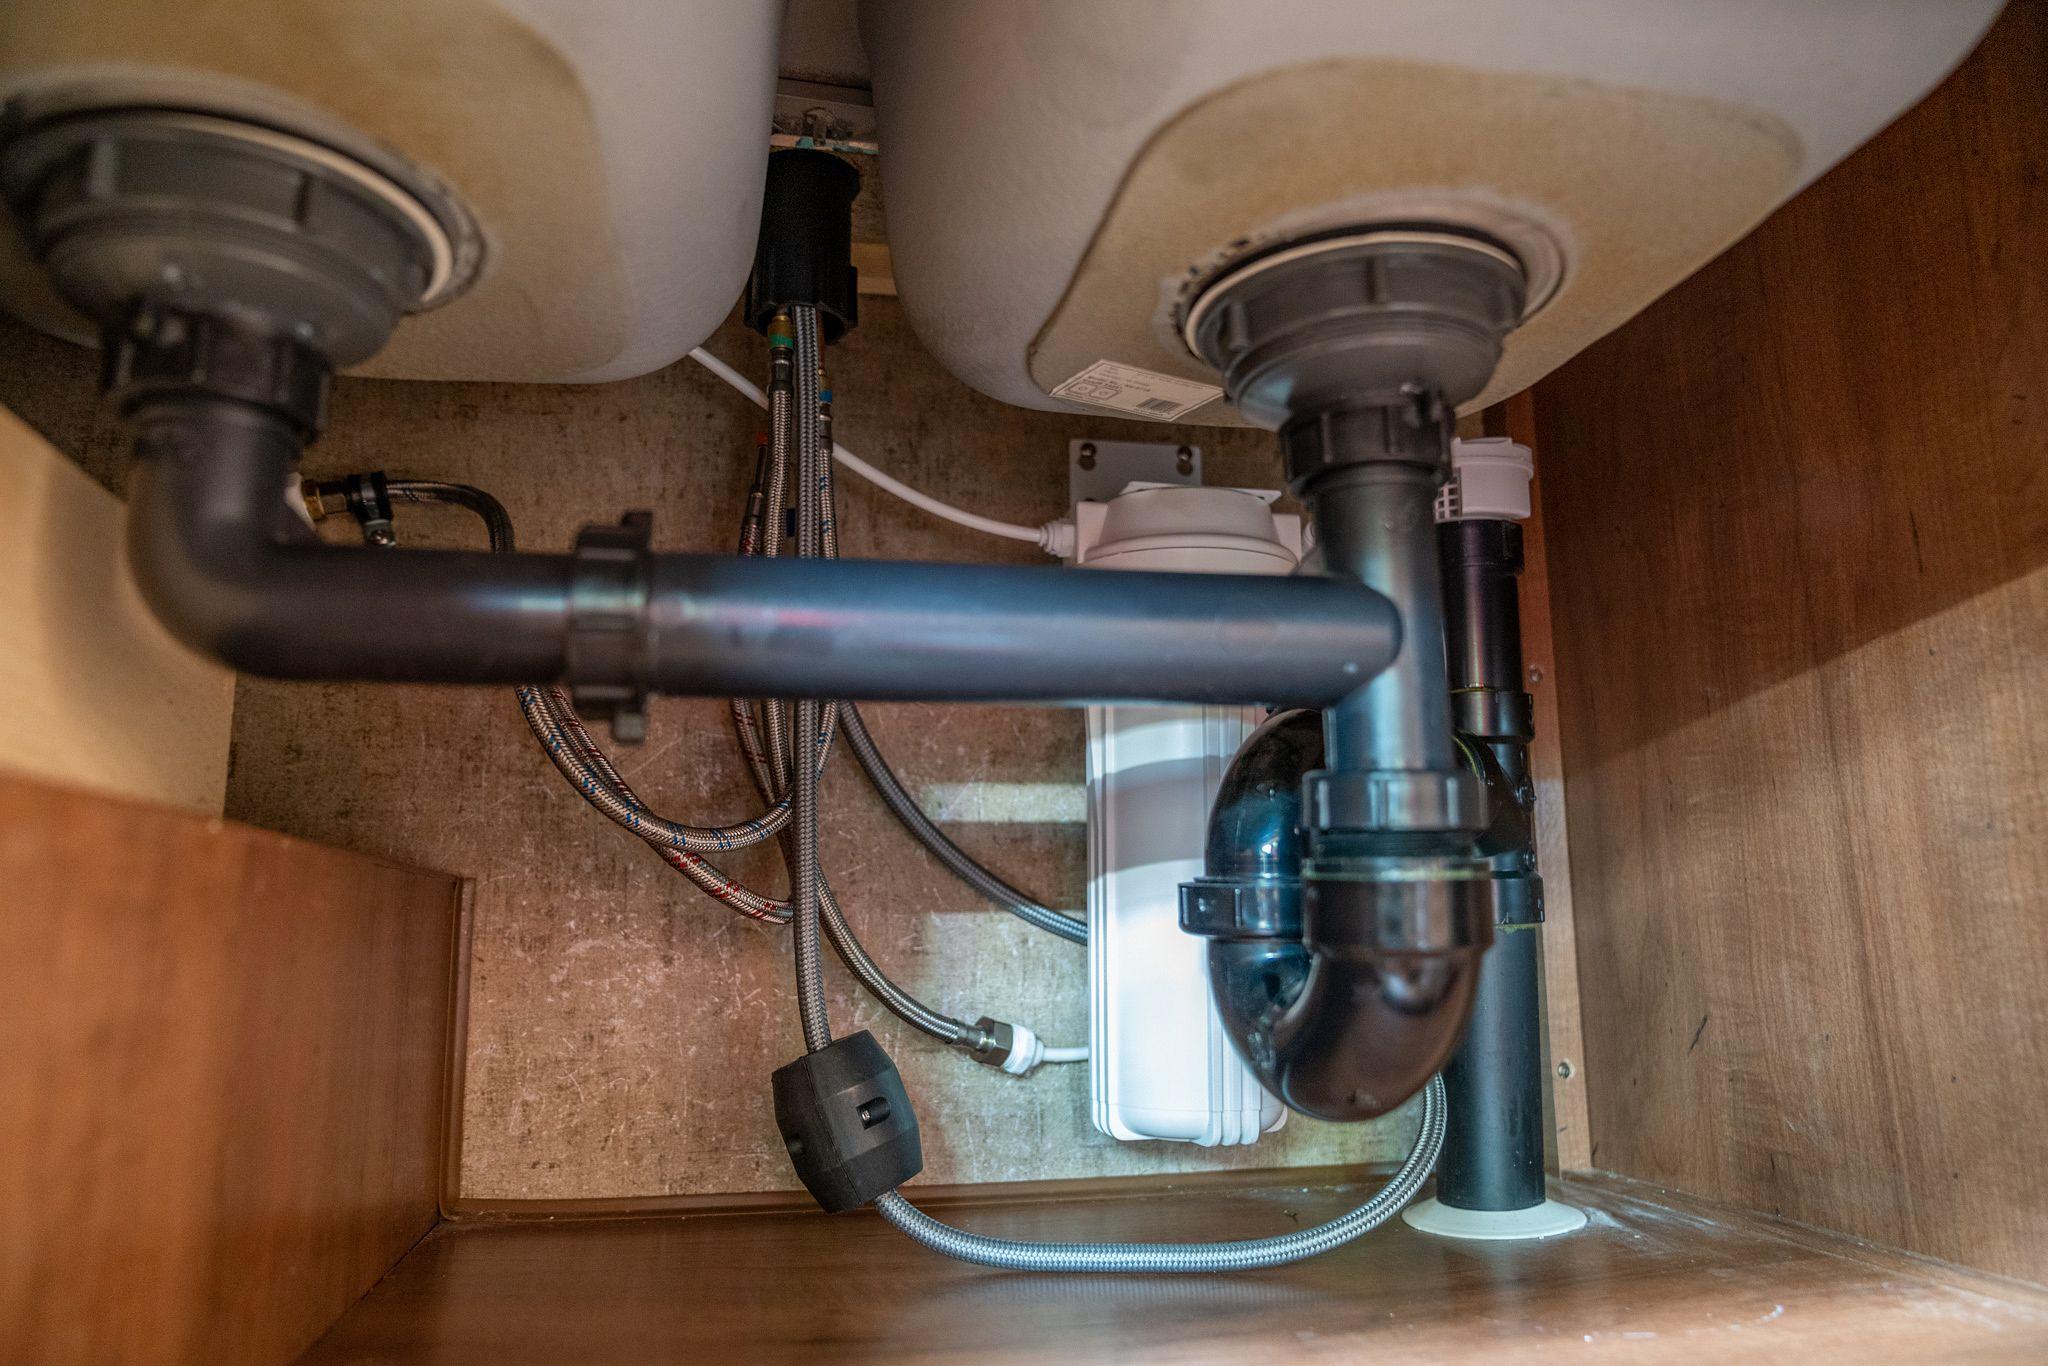 Faucet & Water Filter Plumbing